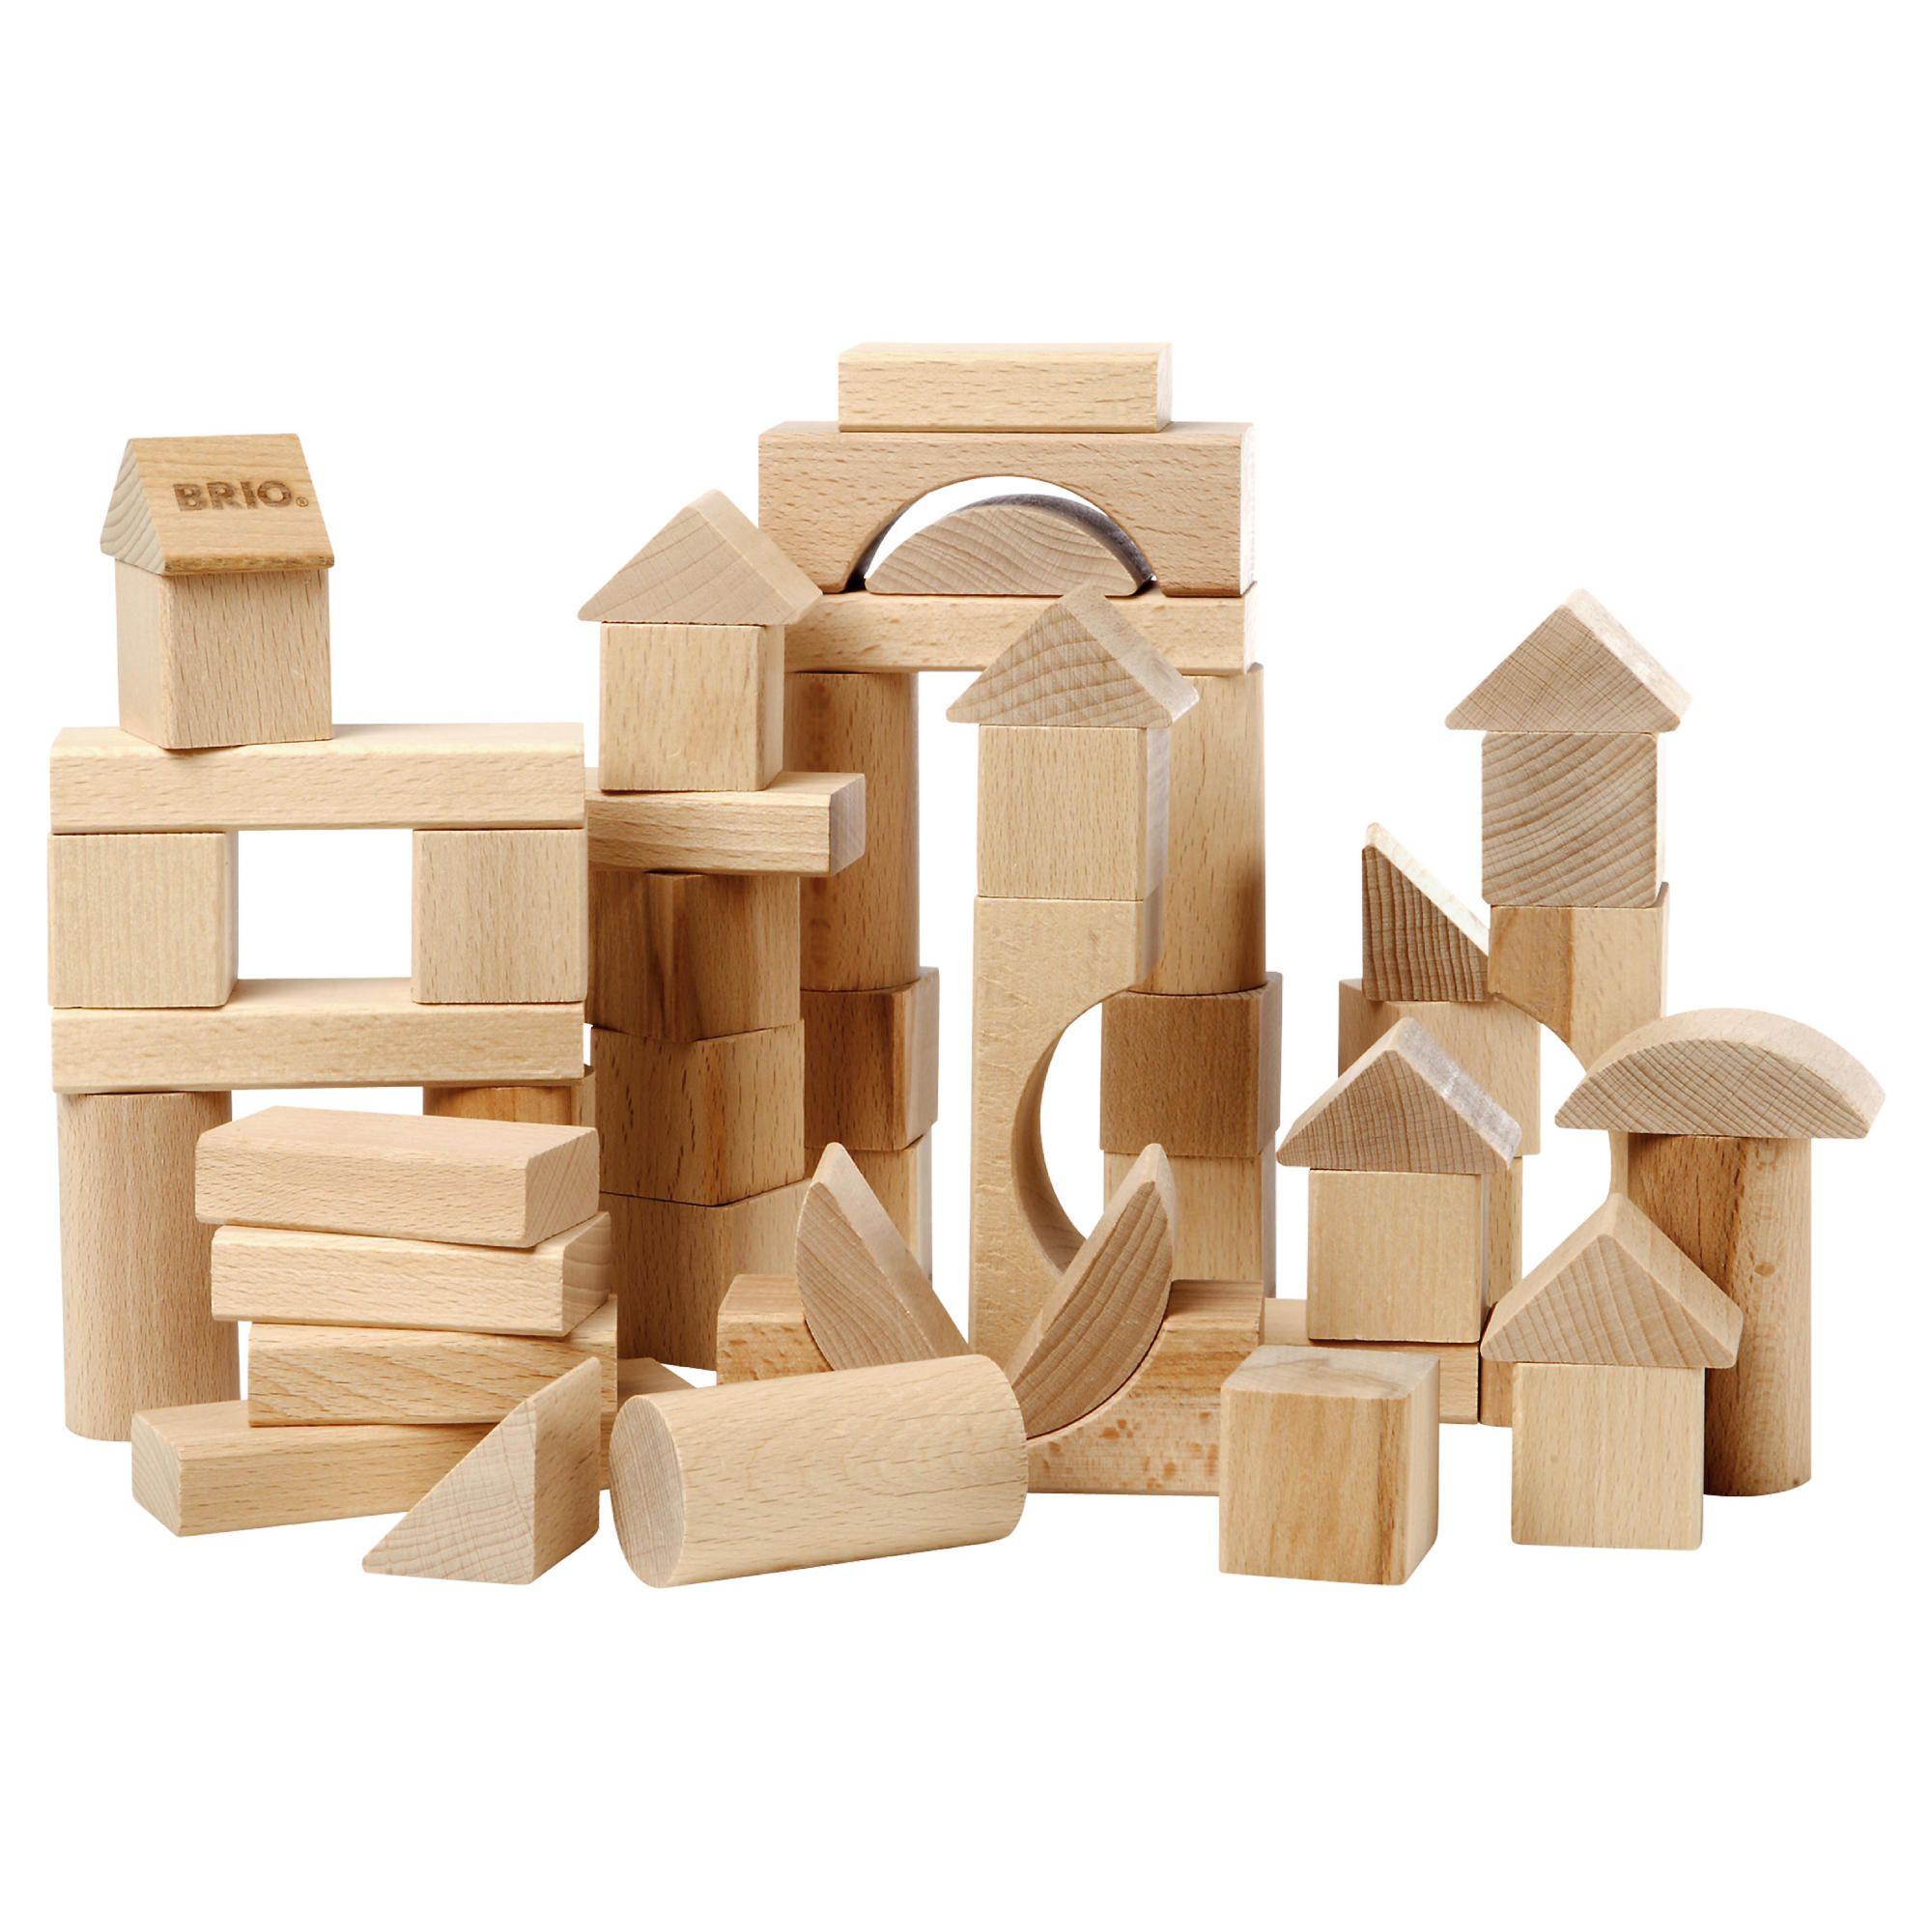 depols: plan toys wooden blocks